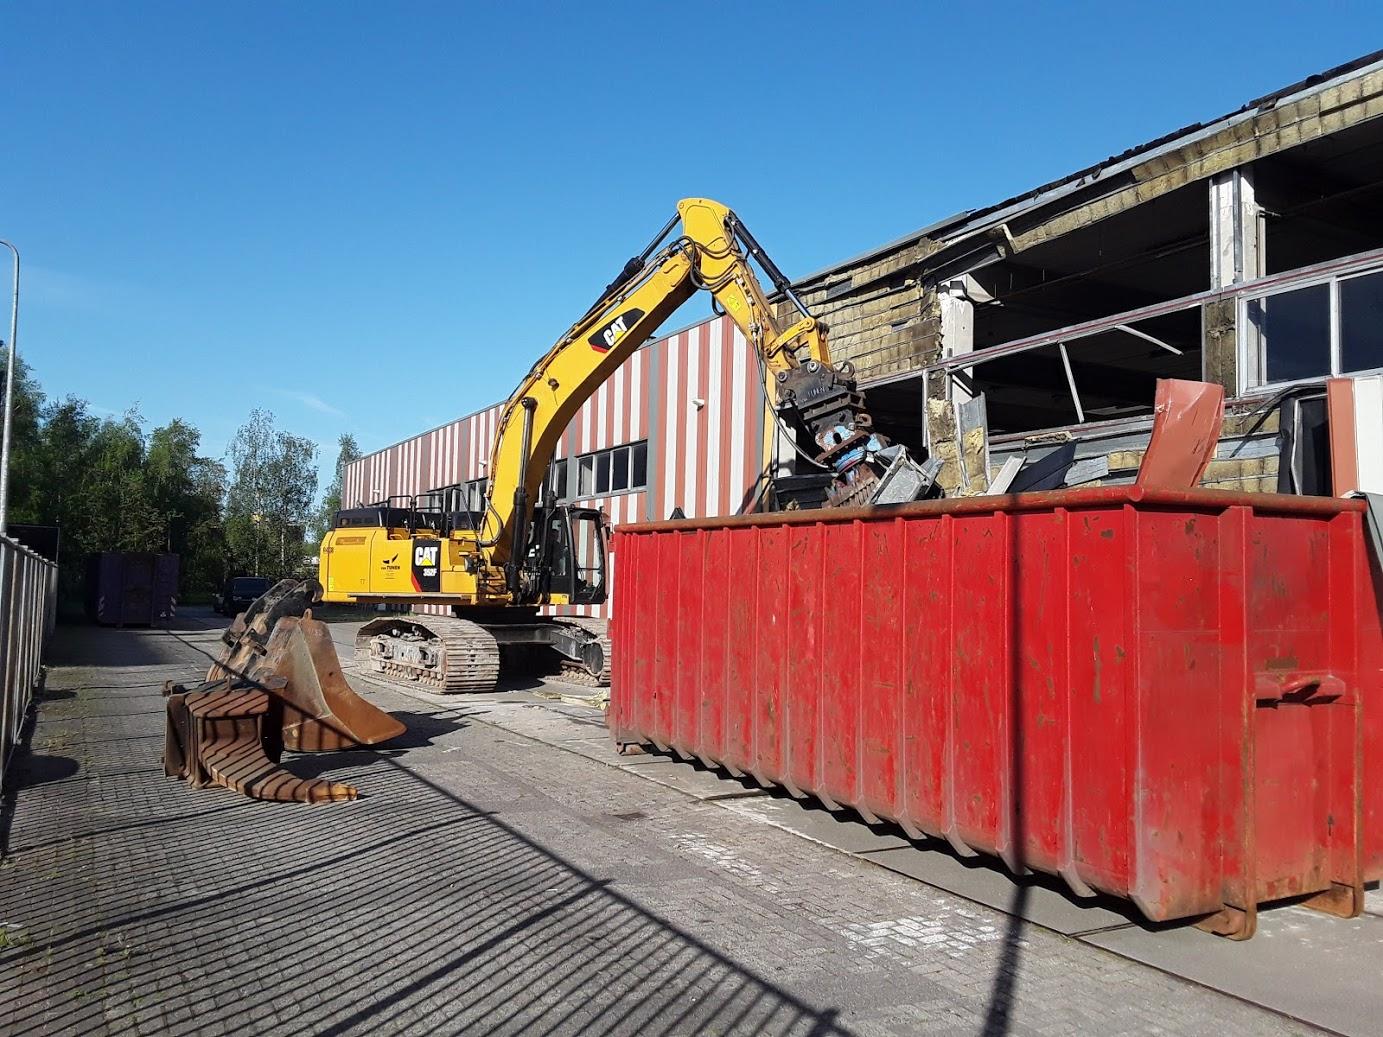 05/2018 Demolition Uithoorn, the Netherlands